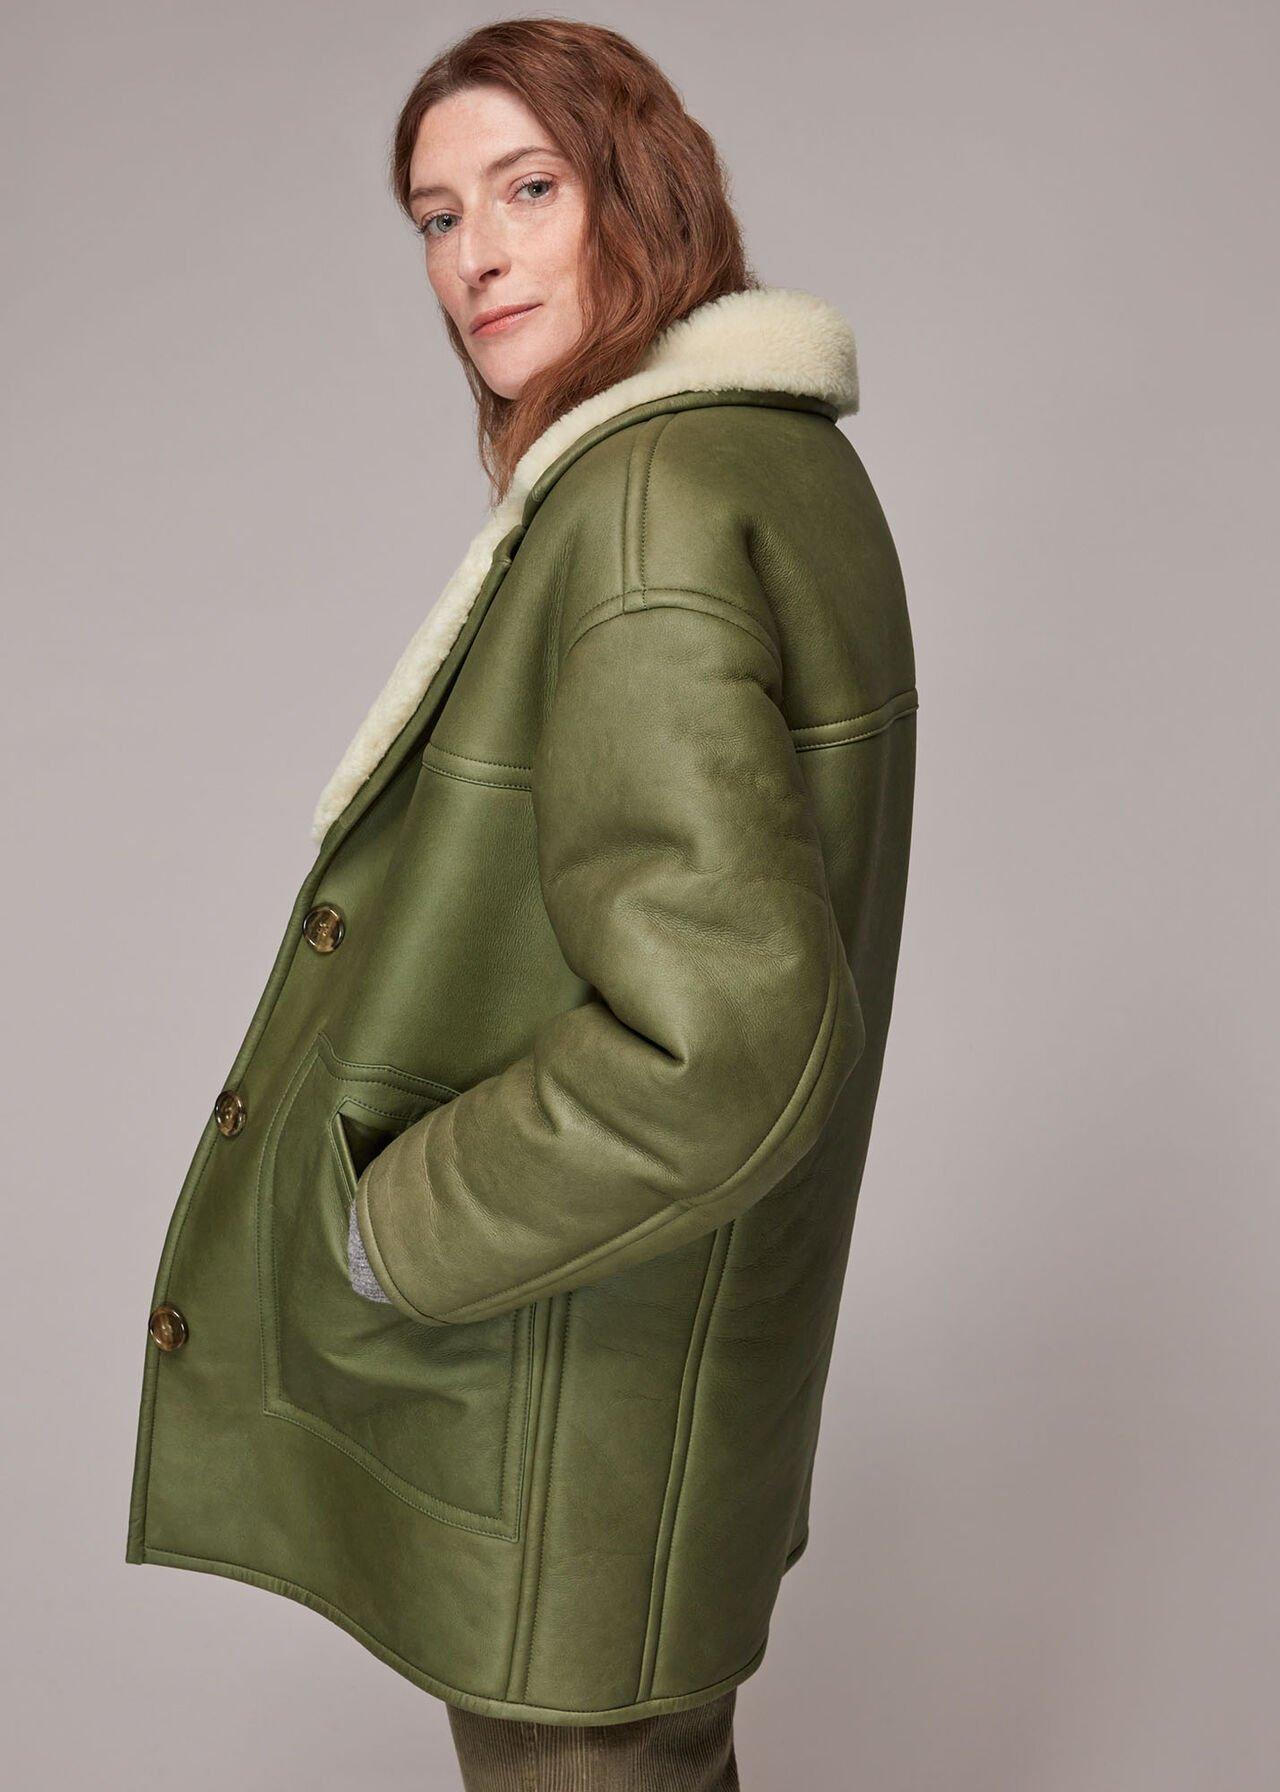 Fia Shearling Jacket